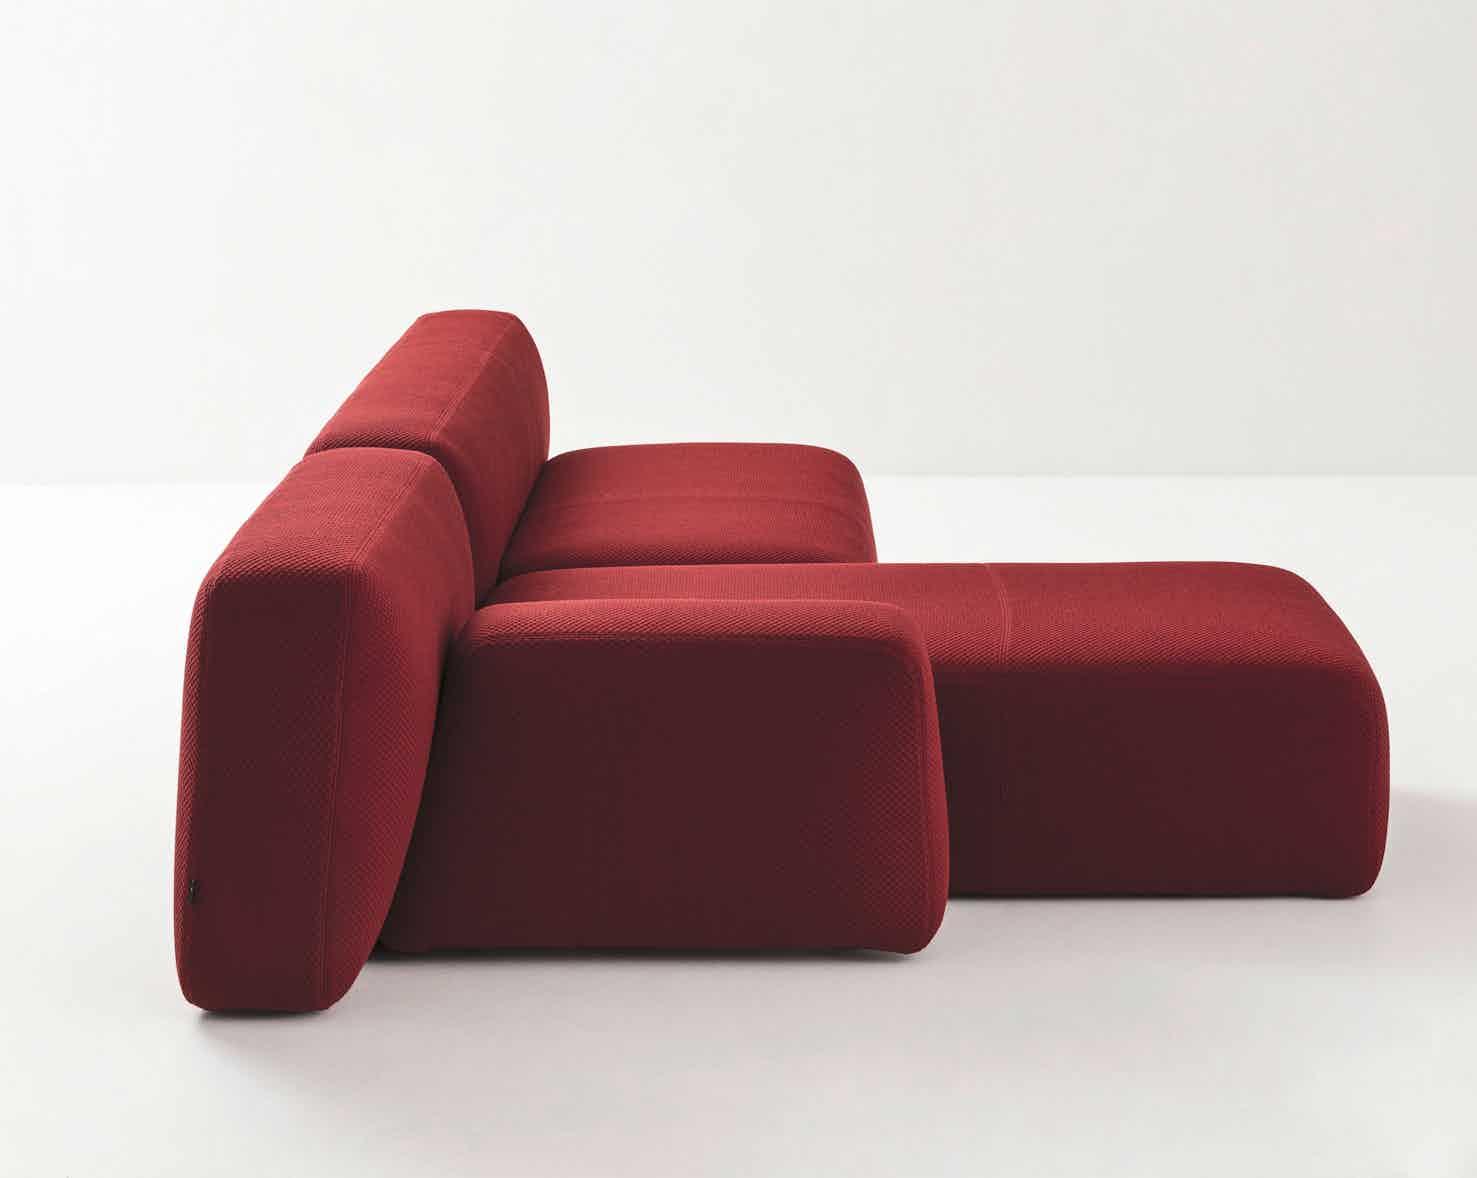 La-cividina-suiseki-sofa-red-haute-living